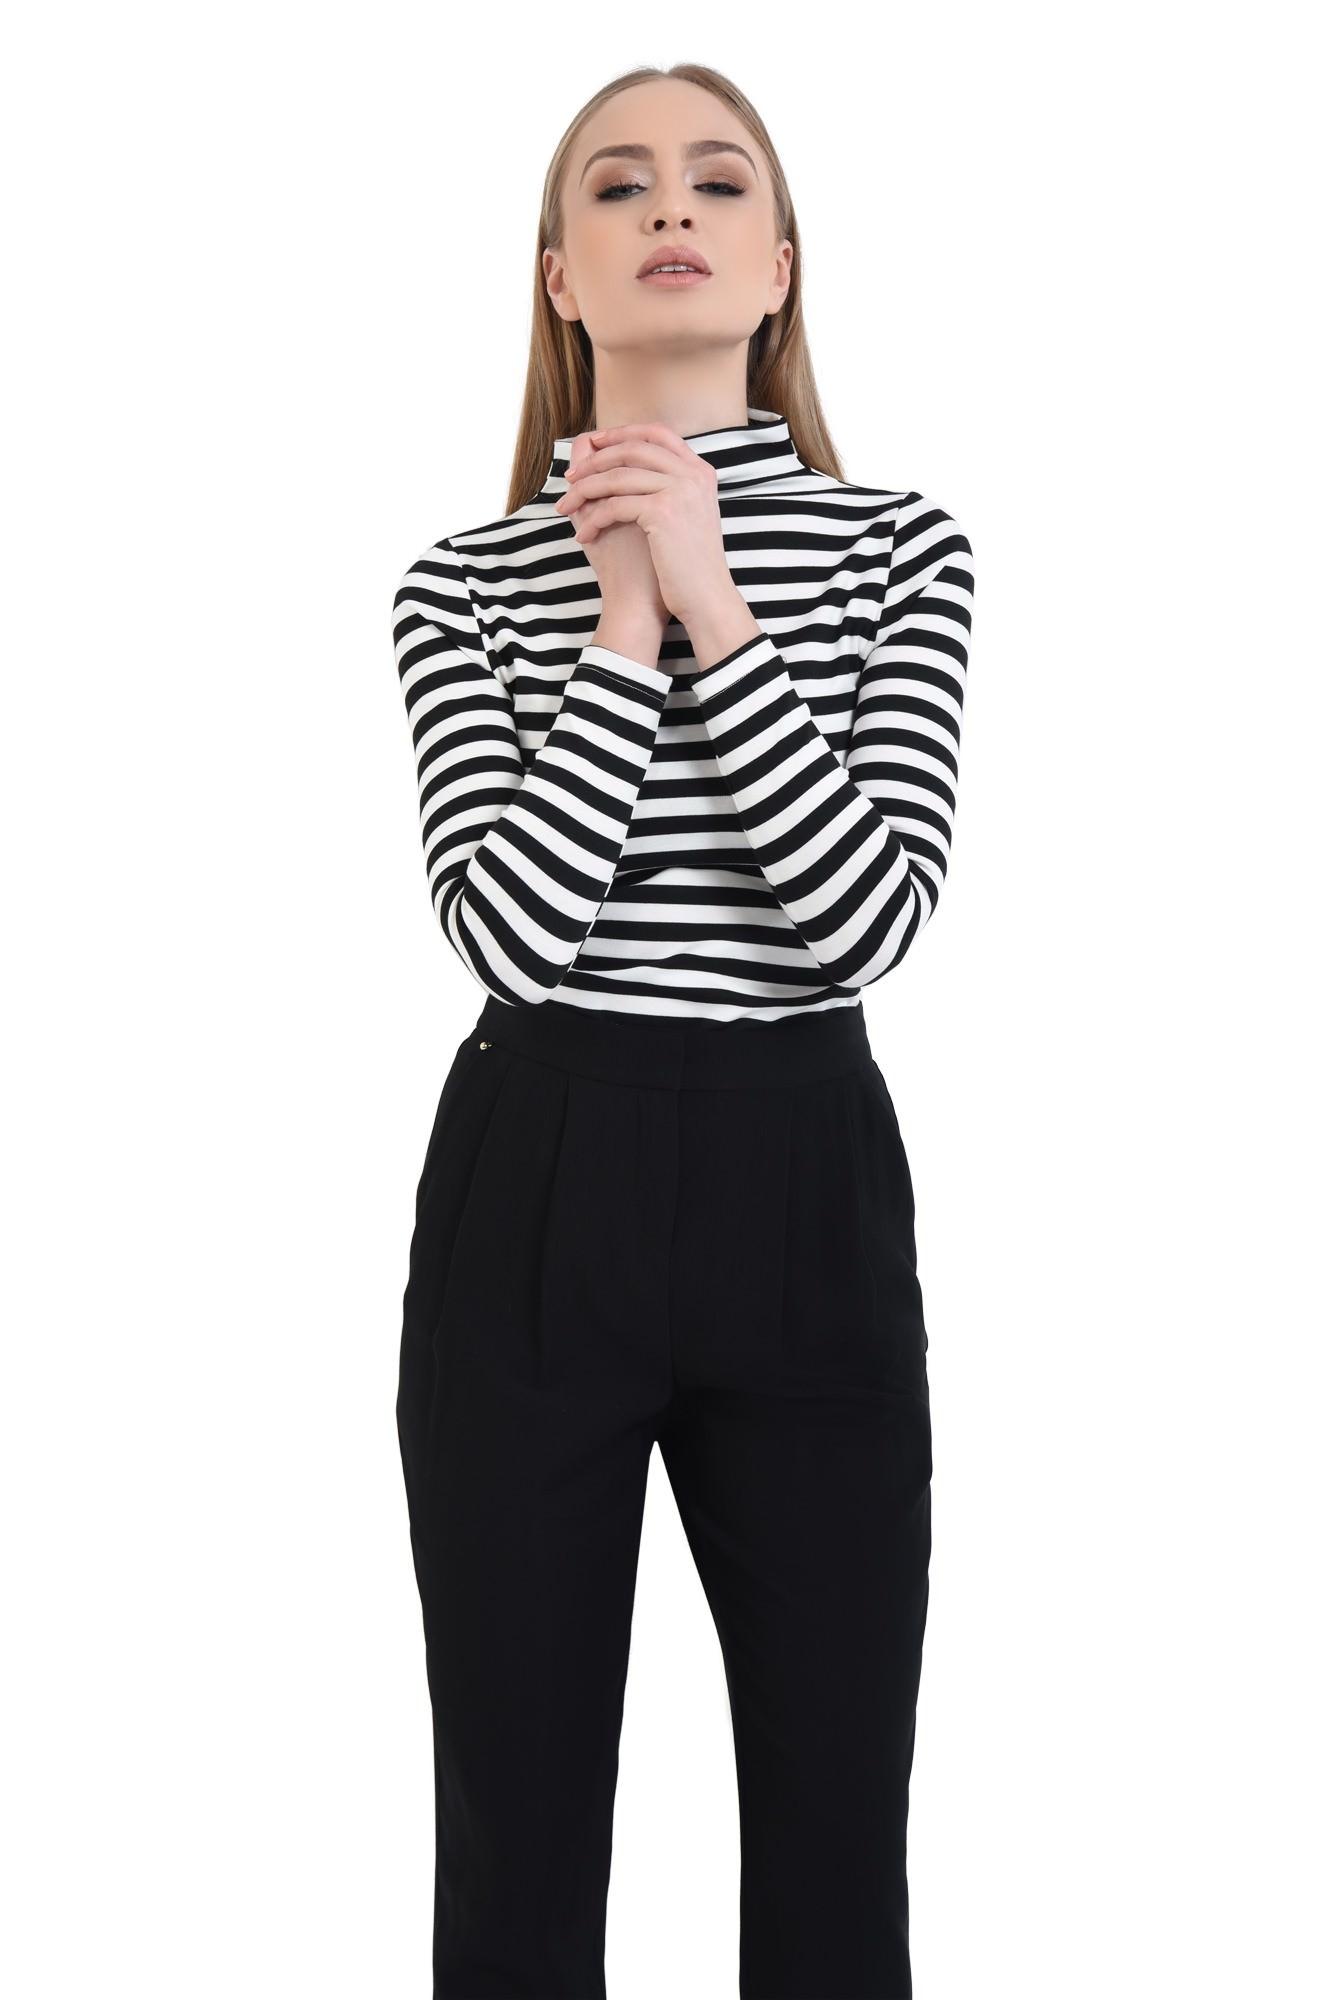 0 - Bluza casual, dungi, alb-negru